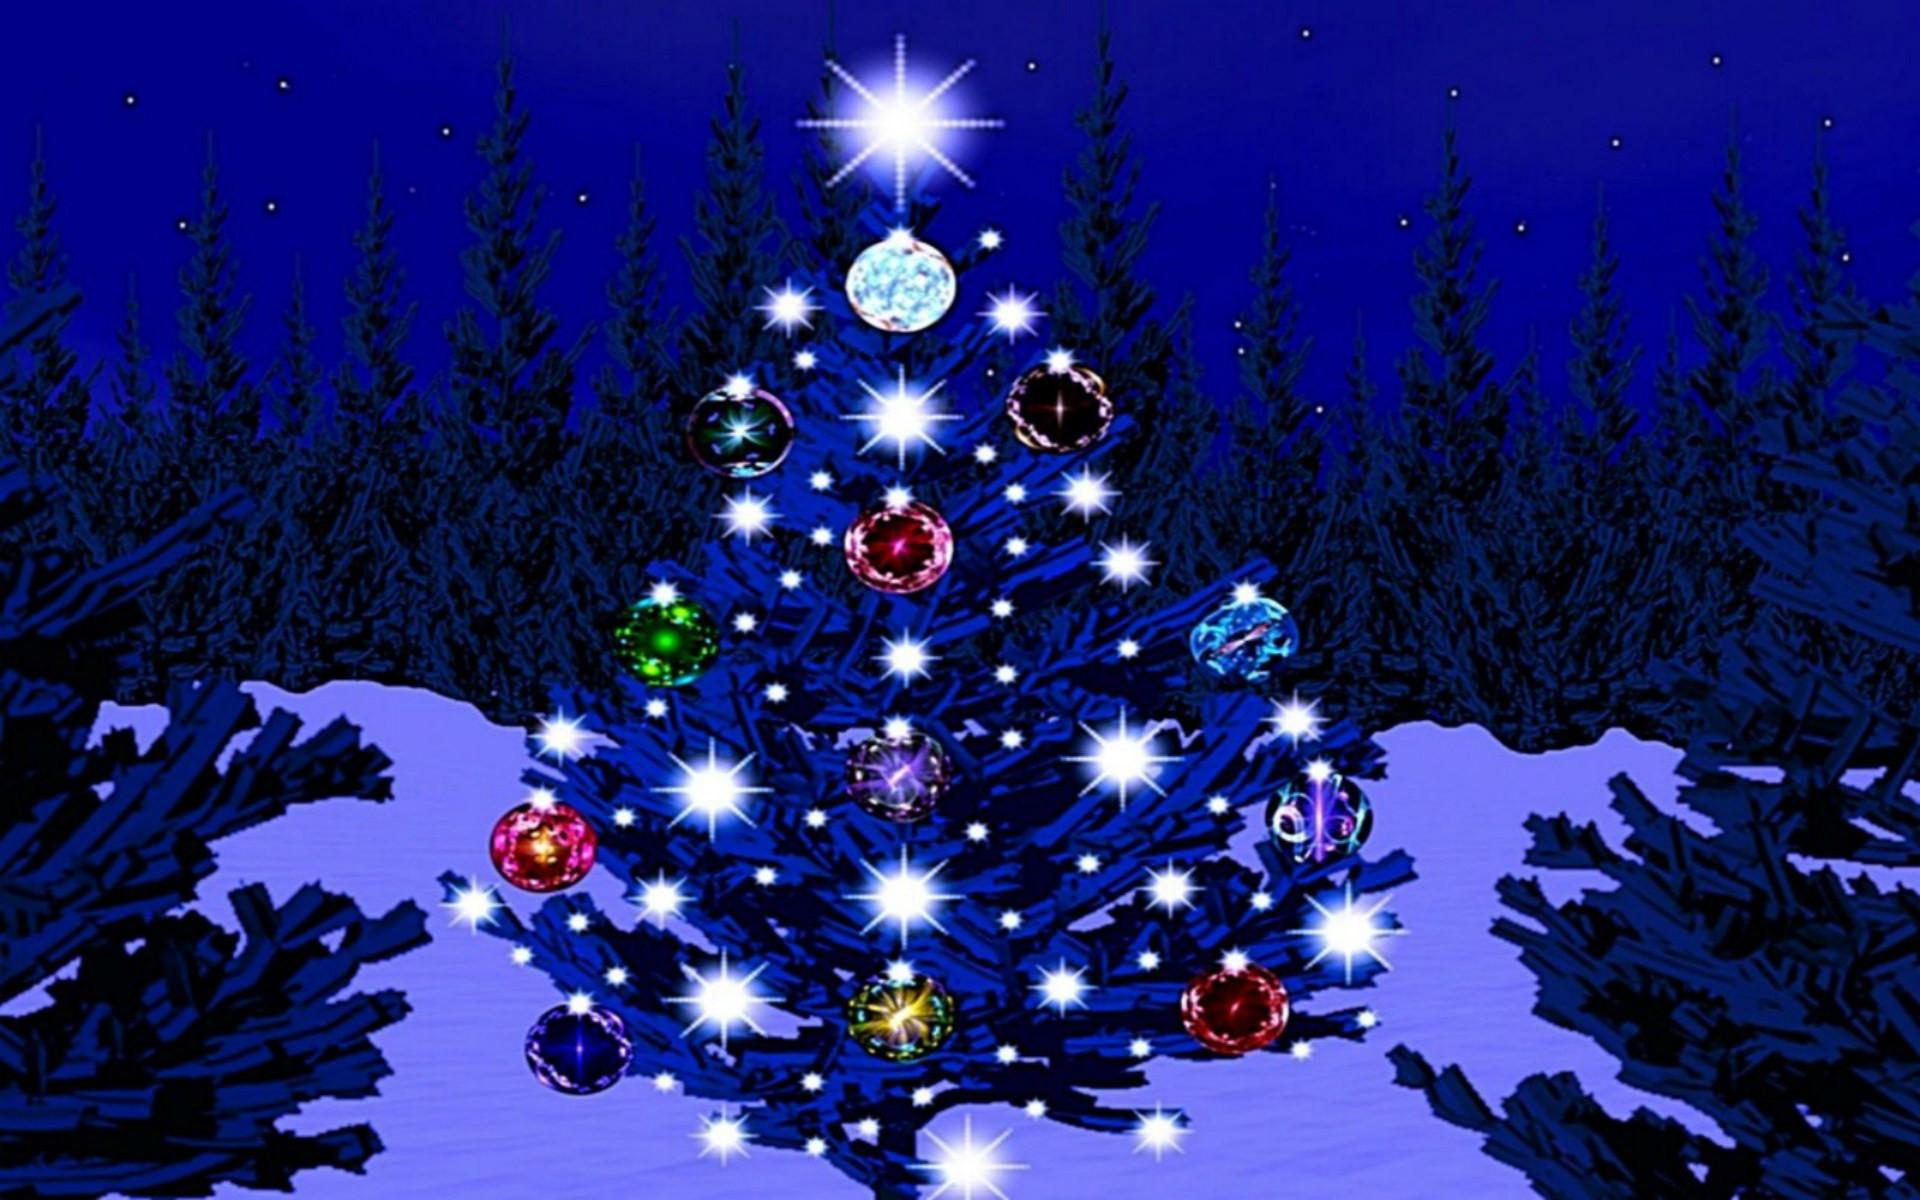 Christmas tree desktop background 74 images - Free christmas wallpaper backgrounds ...